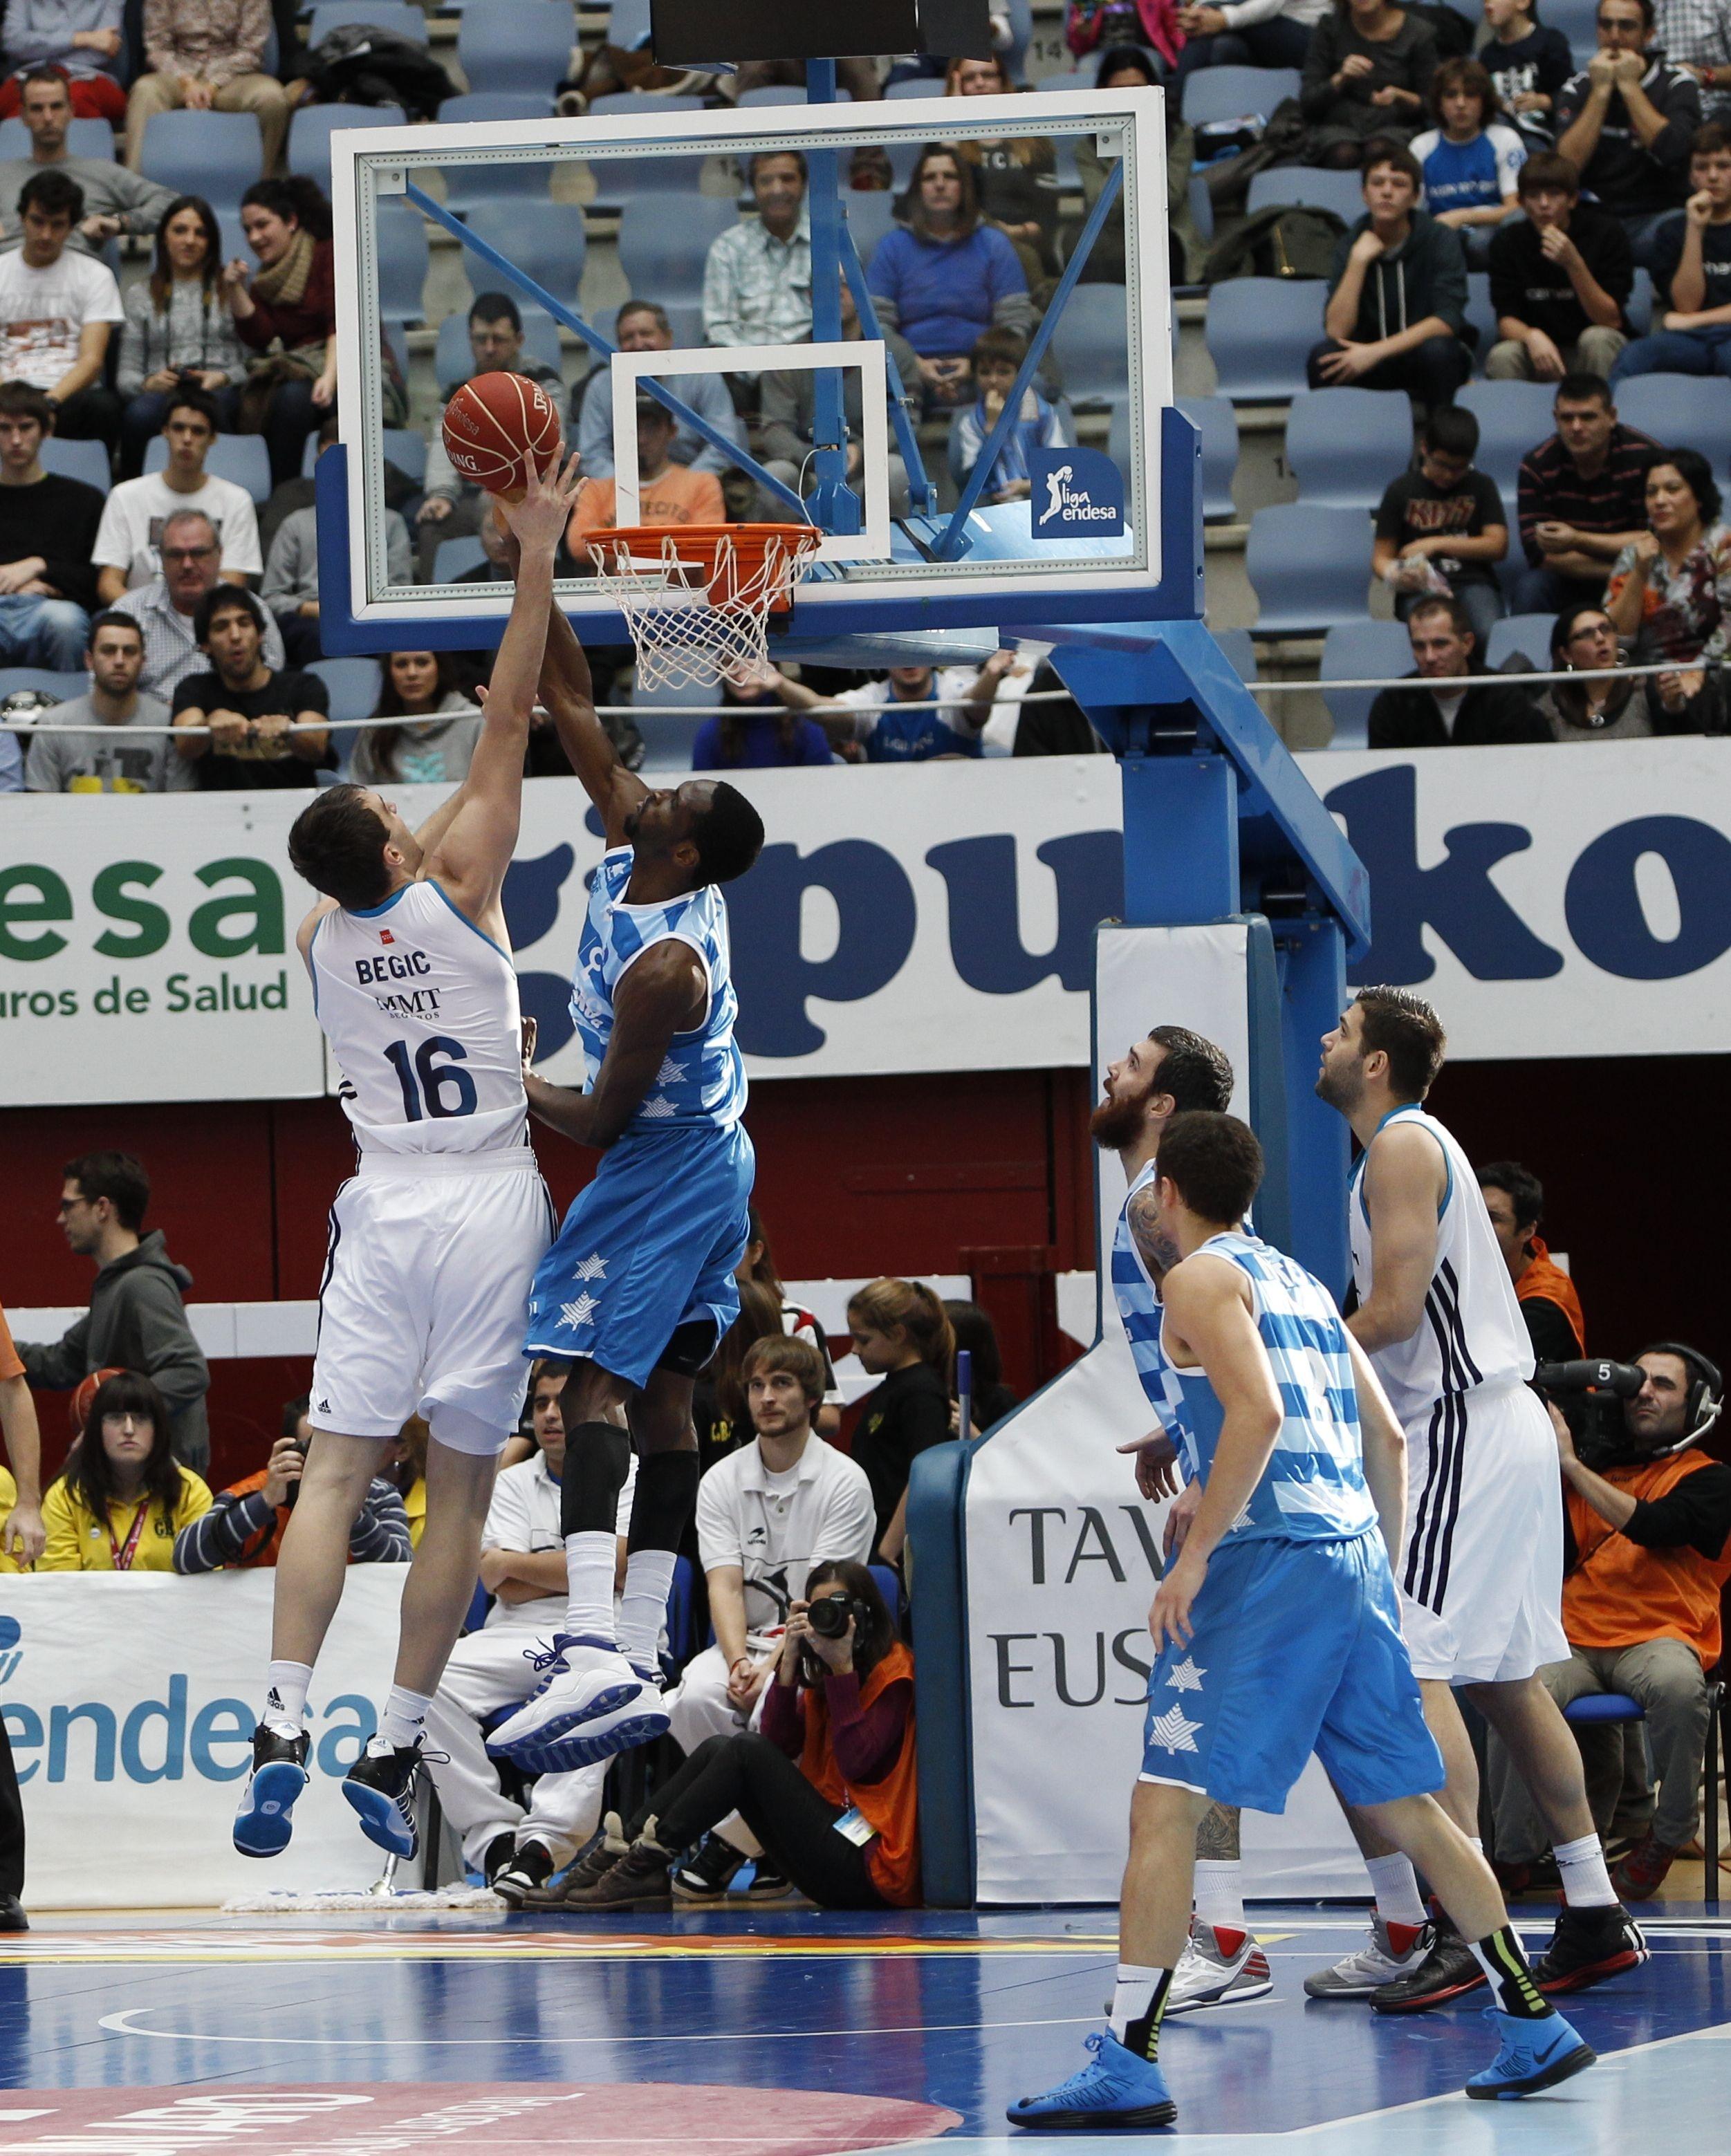 La Asamblea de la ACB ratifica la admisión del Gipuzkoa Basket